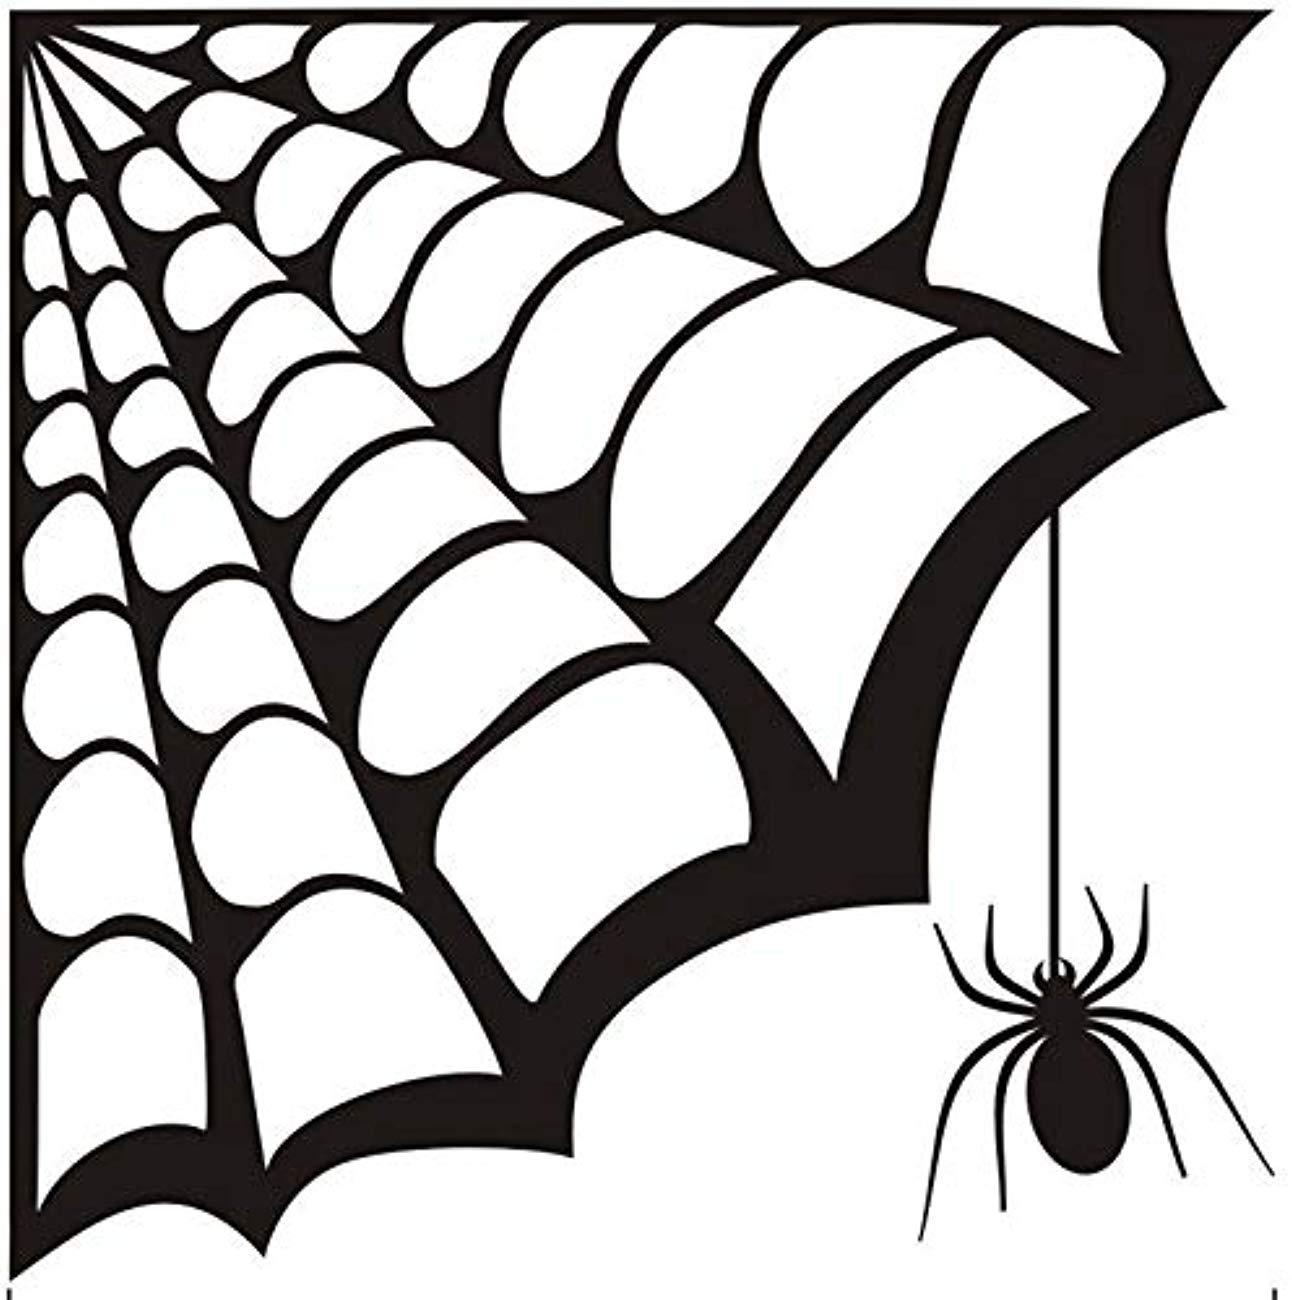 Amazon.com: Bro Decals Wall Vinyl Decal Spider Web Corner.